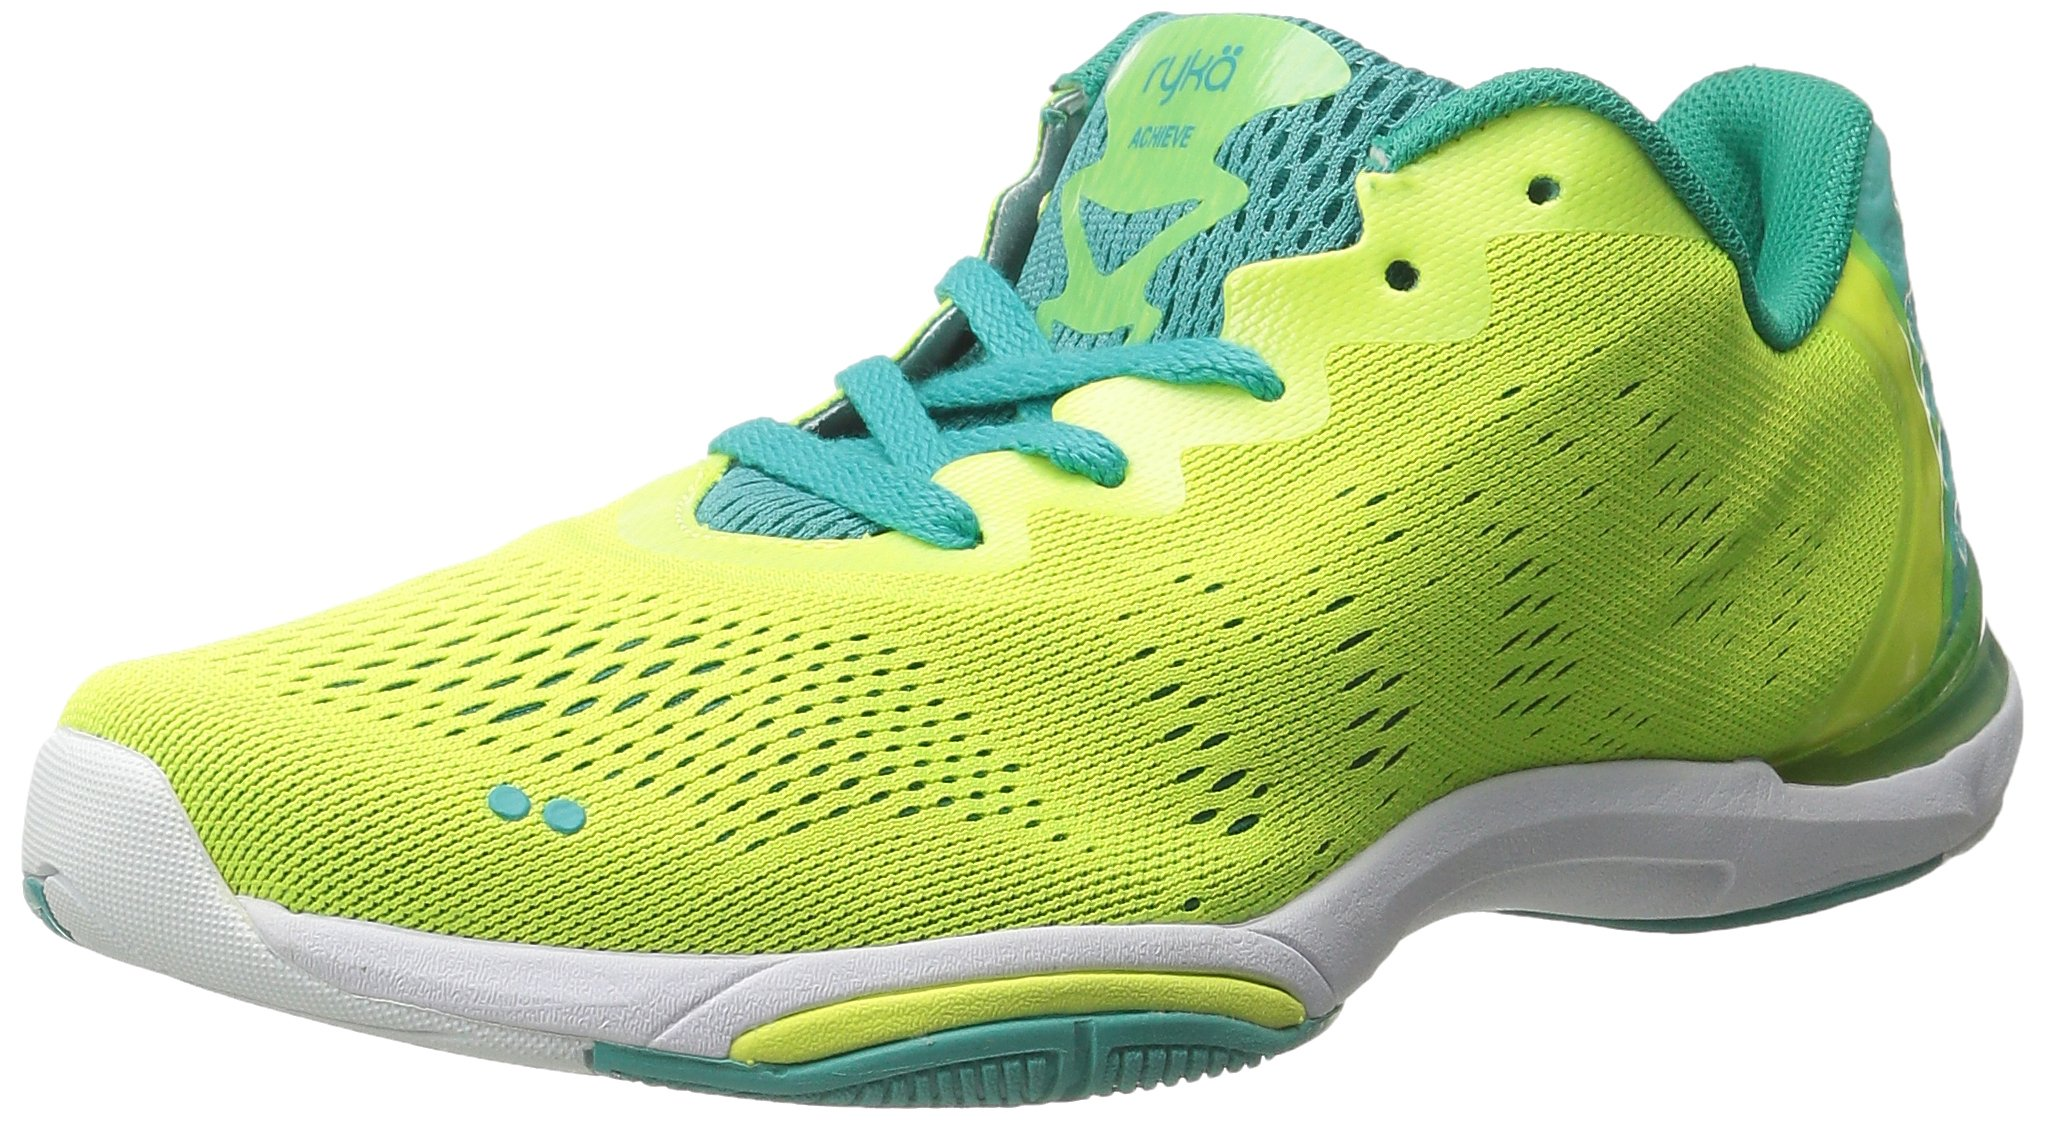 RYKA Women's Achieve Cross-Training Shoe, Yellow/Teal, 10 M US